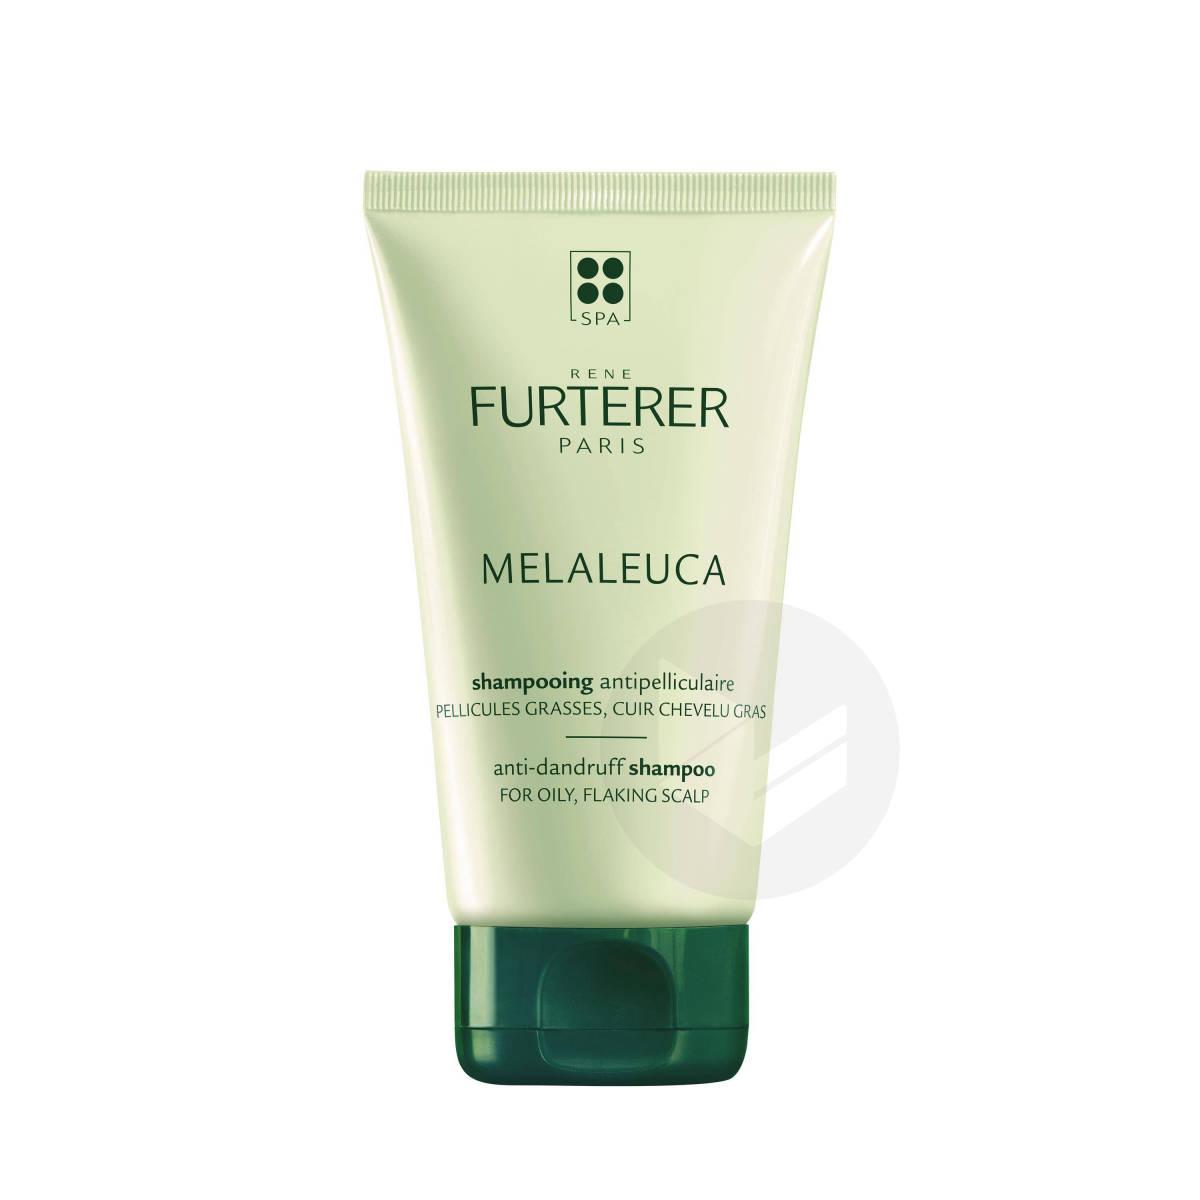 Shampooing antipelliculaire pellicules grasses, cuir chevelu gras 150ml